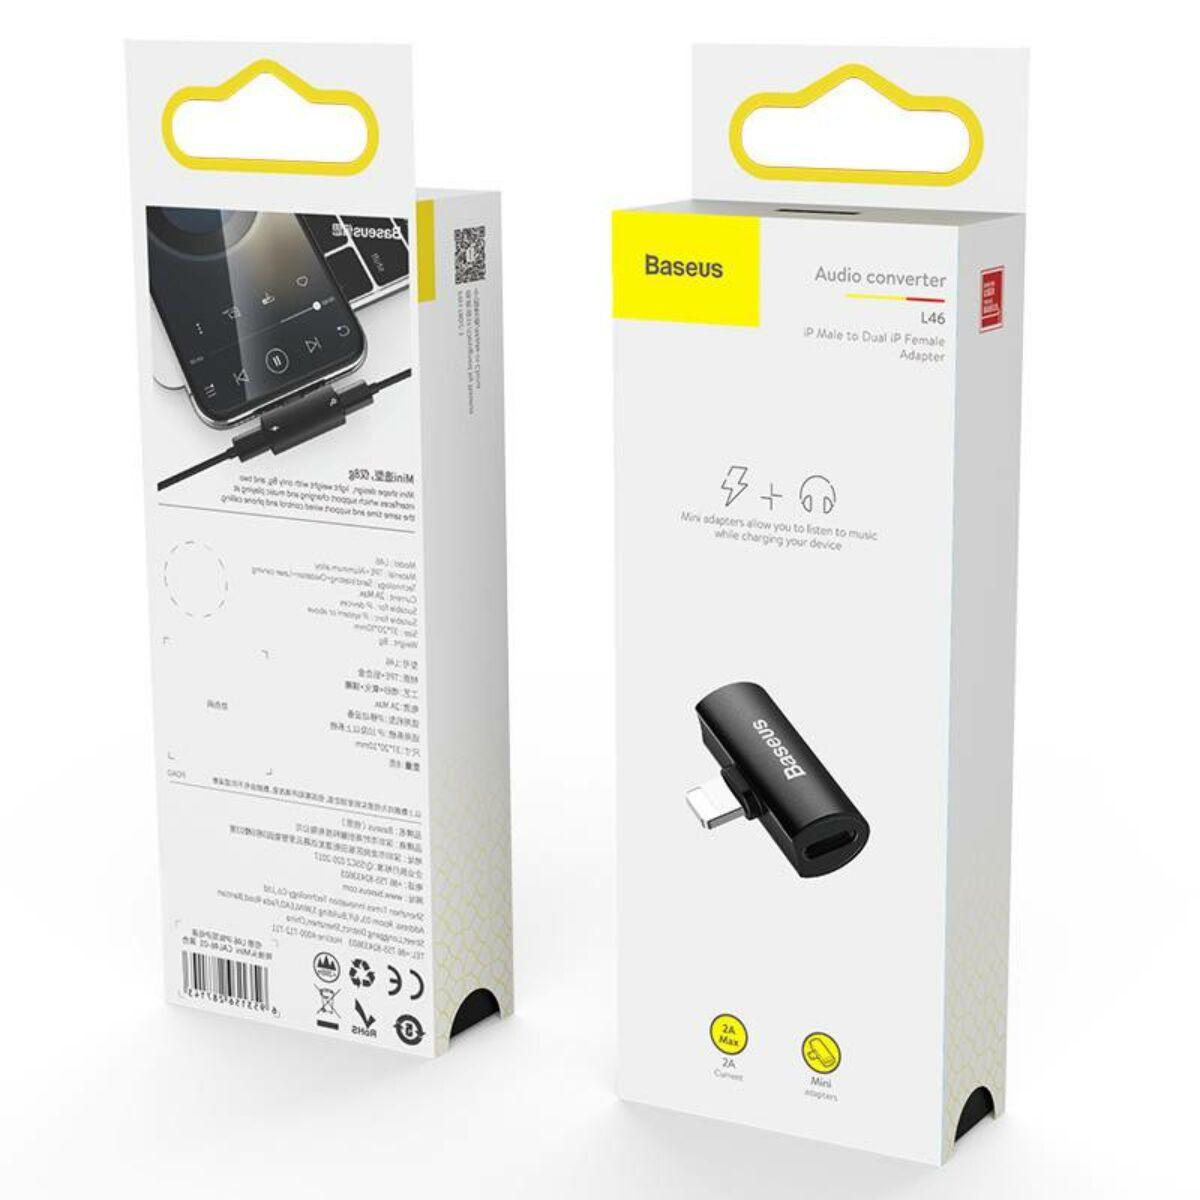 Baseus átalakító, L46 Lightning [apa] - Dual Lightning [anya] adapter fekete (CAL46-01)